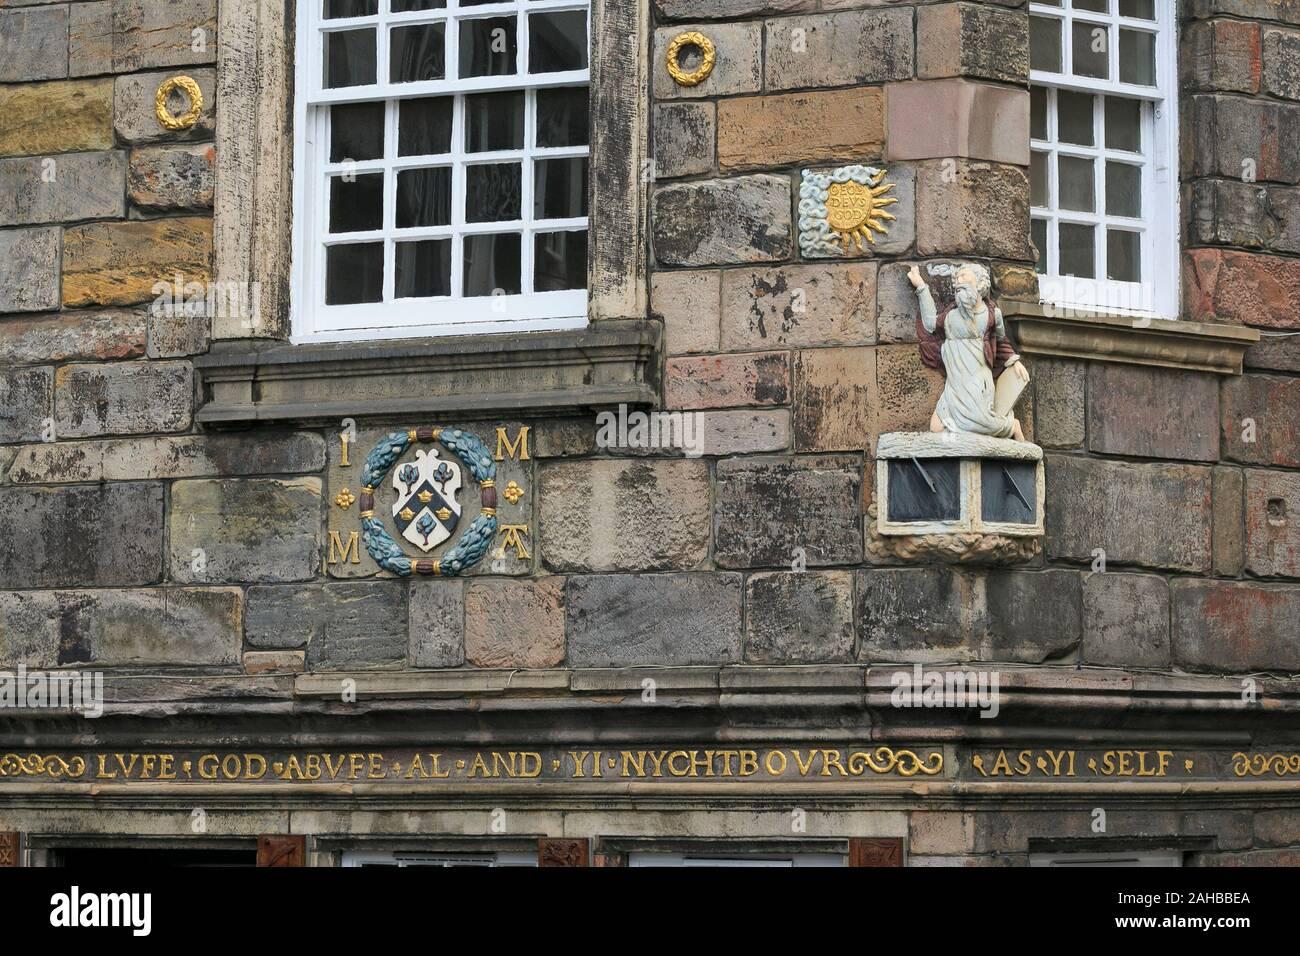 John Knox House, The Royal Mile, The Old Town, Edinburgh, Scotland, United Kingdom Stock Photo